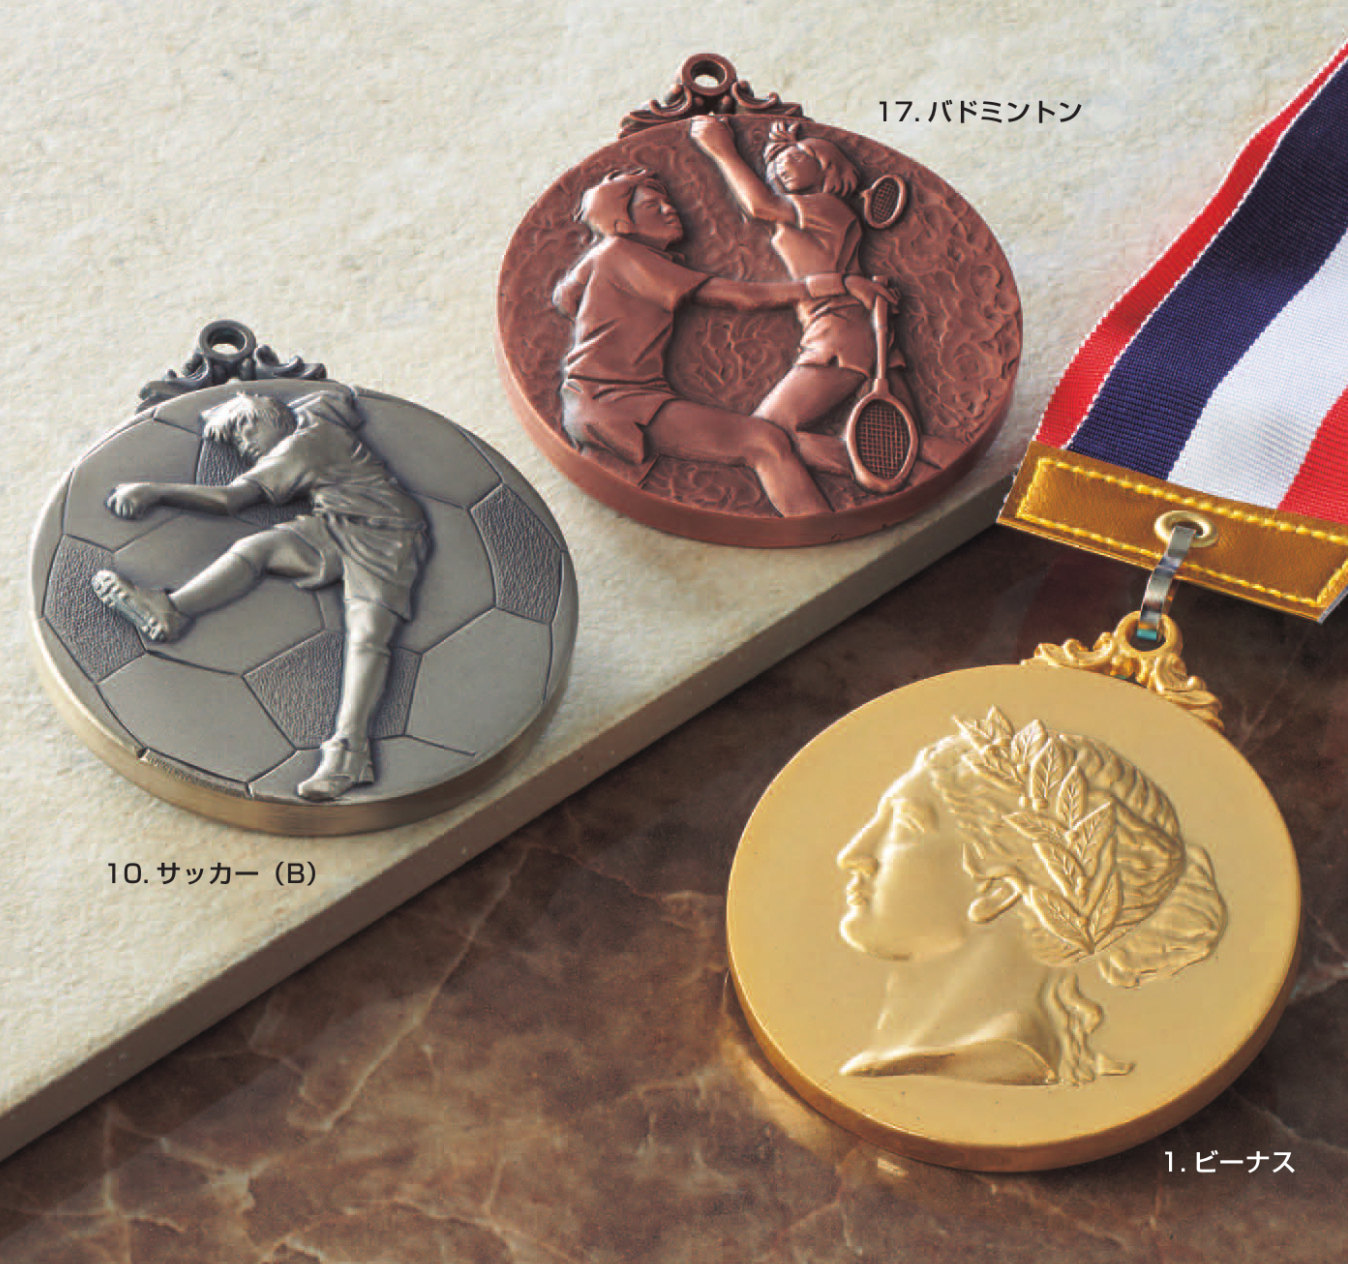 MBメダル